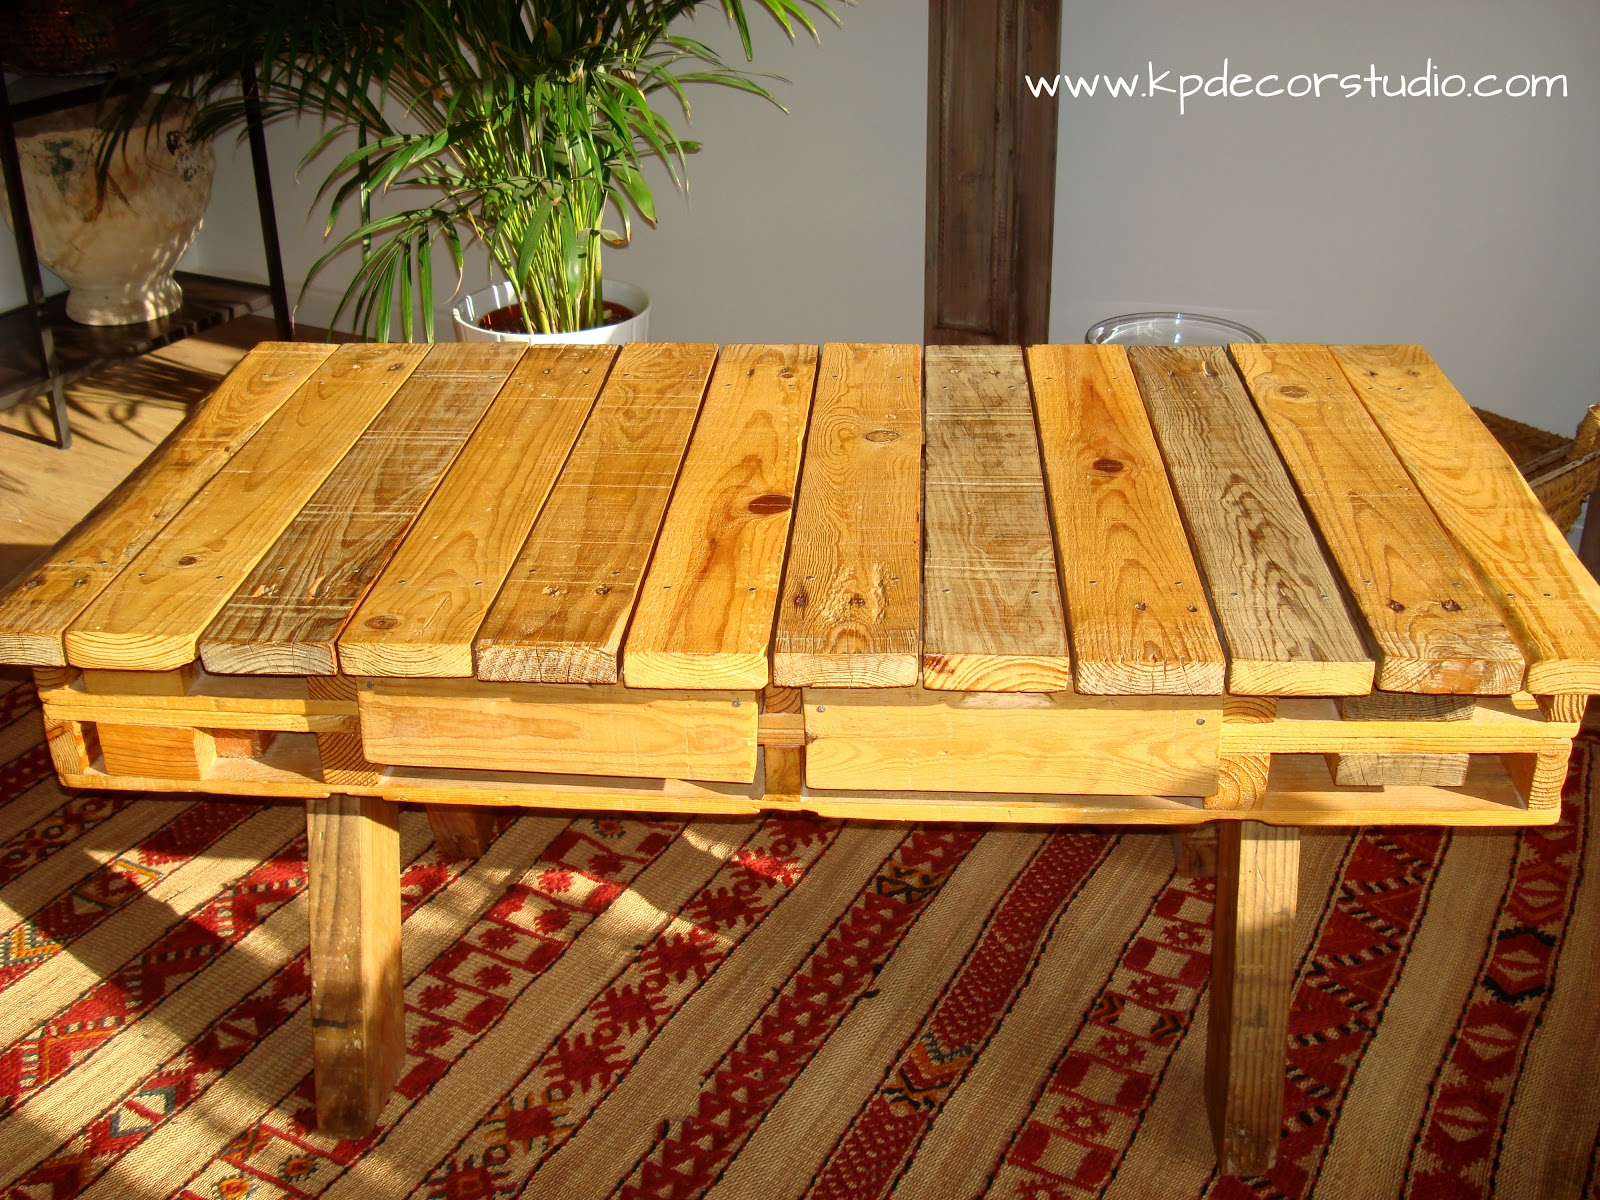 Kp decor studio mesa de madera palet por encargo exclusive wood table for sale - Comprar muebles de palets ...